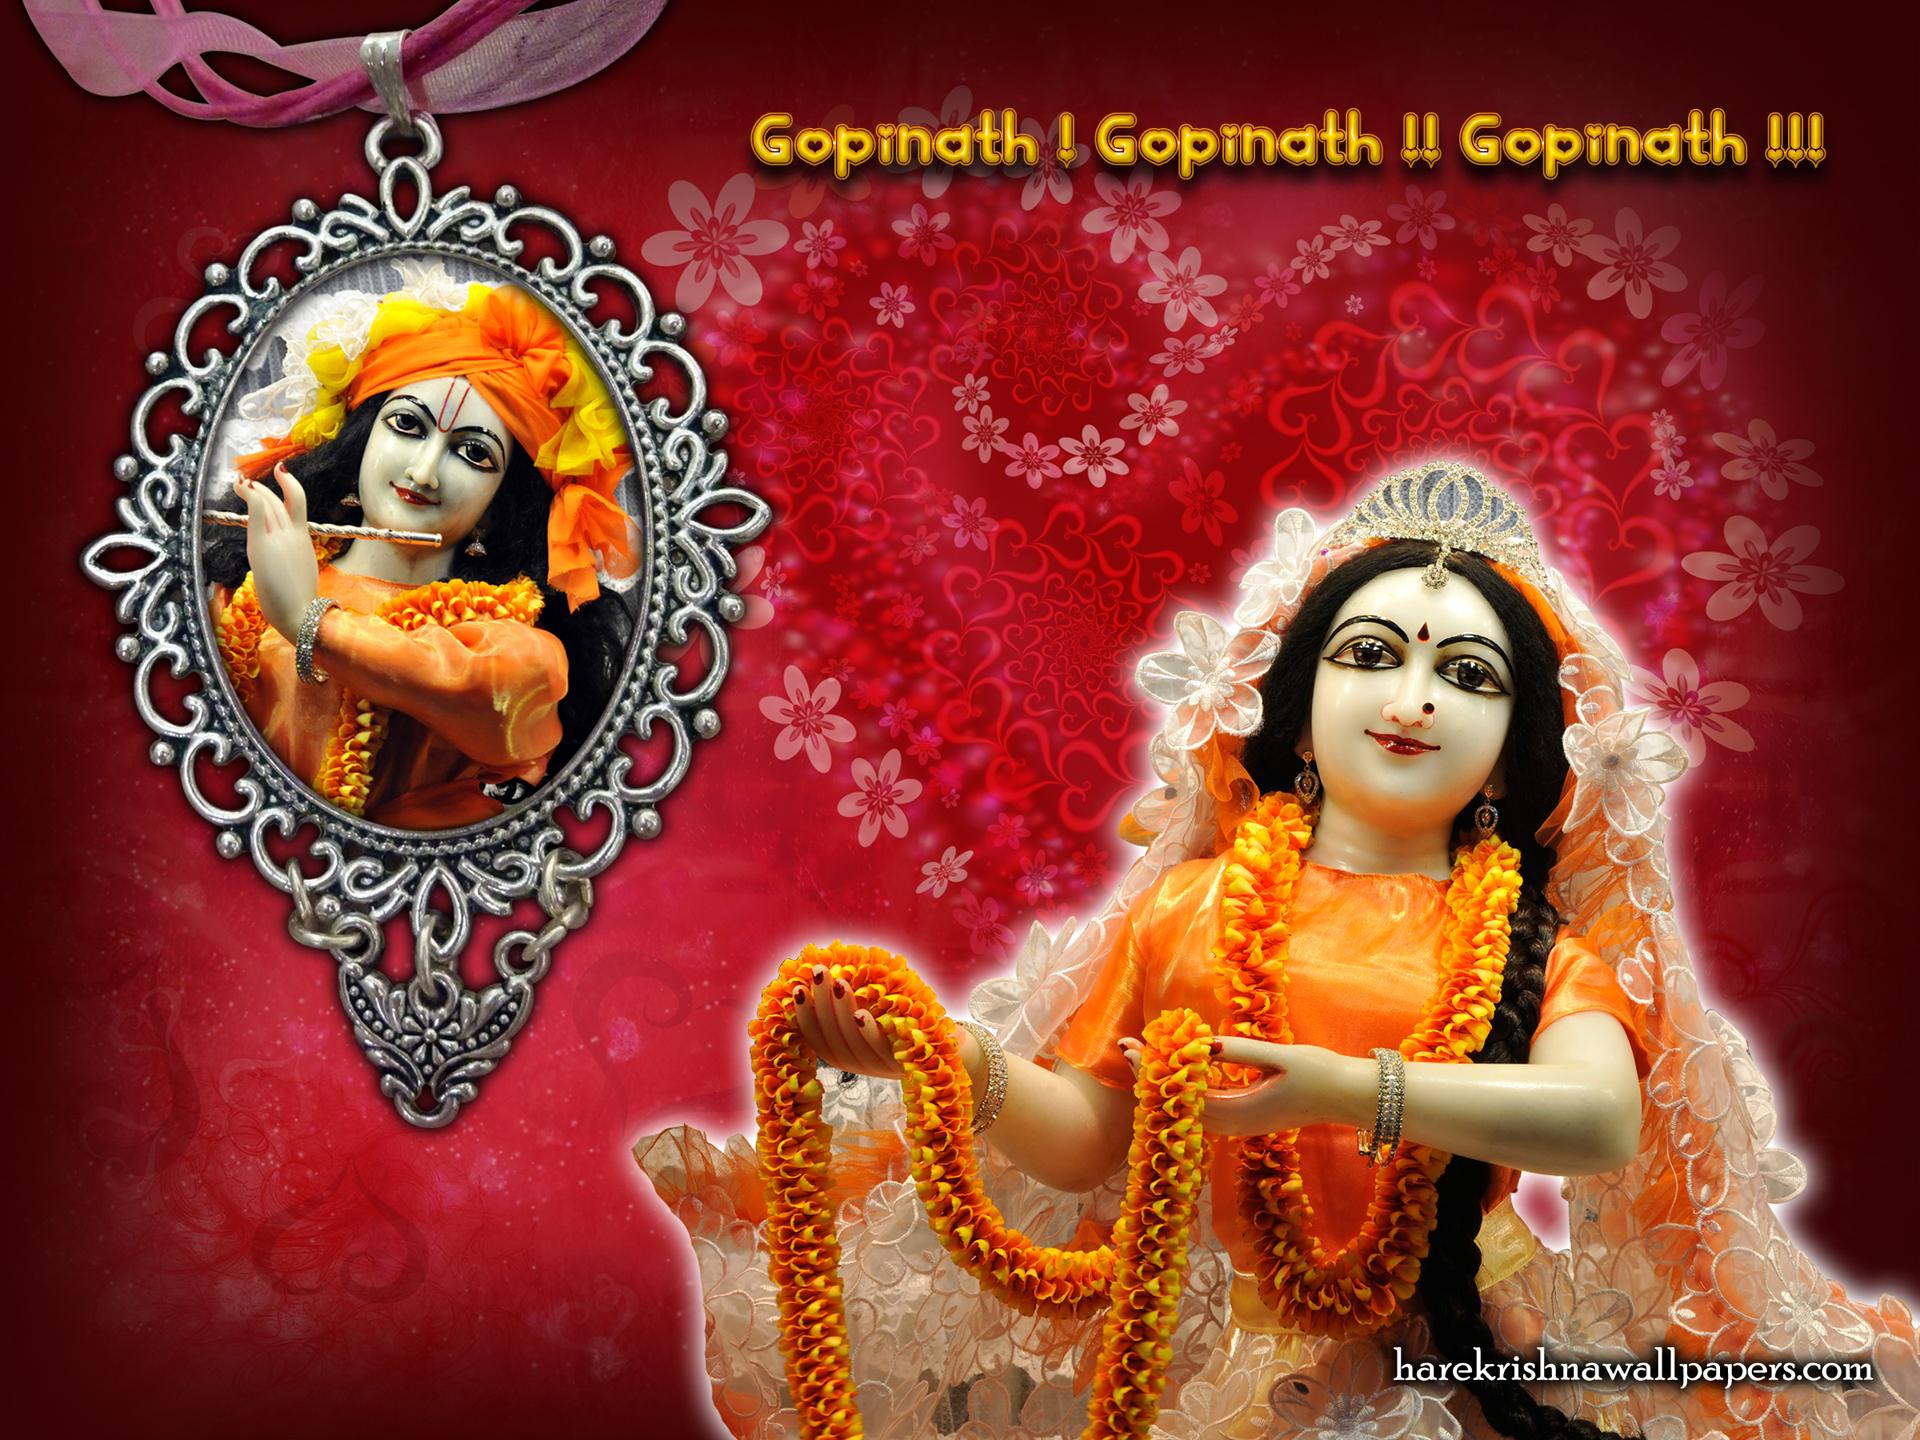 Sri Sri Radha Gopinath Wallpaper (001) Size 1920x1440 Download